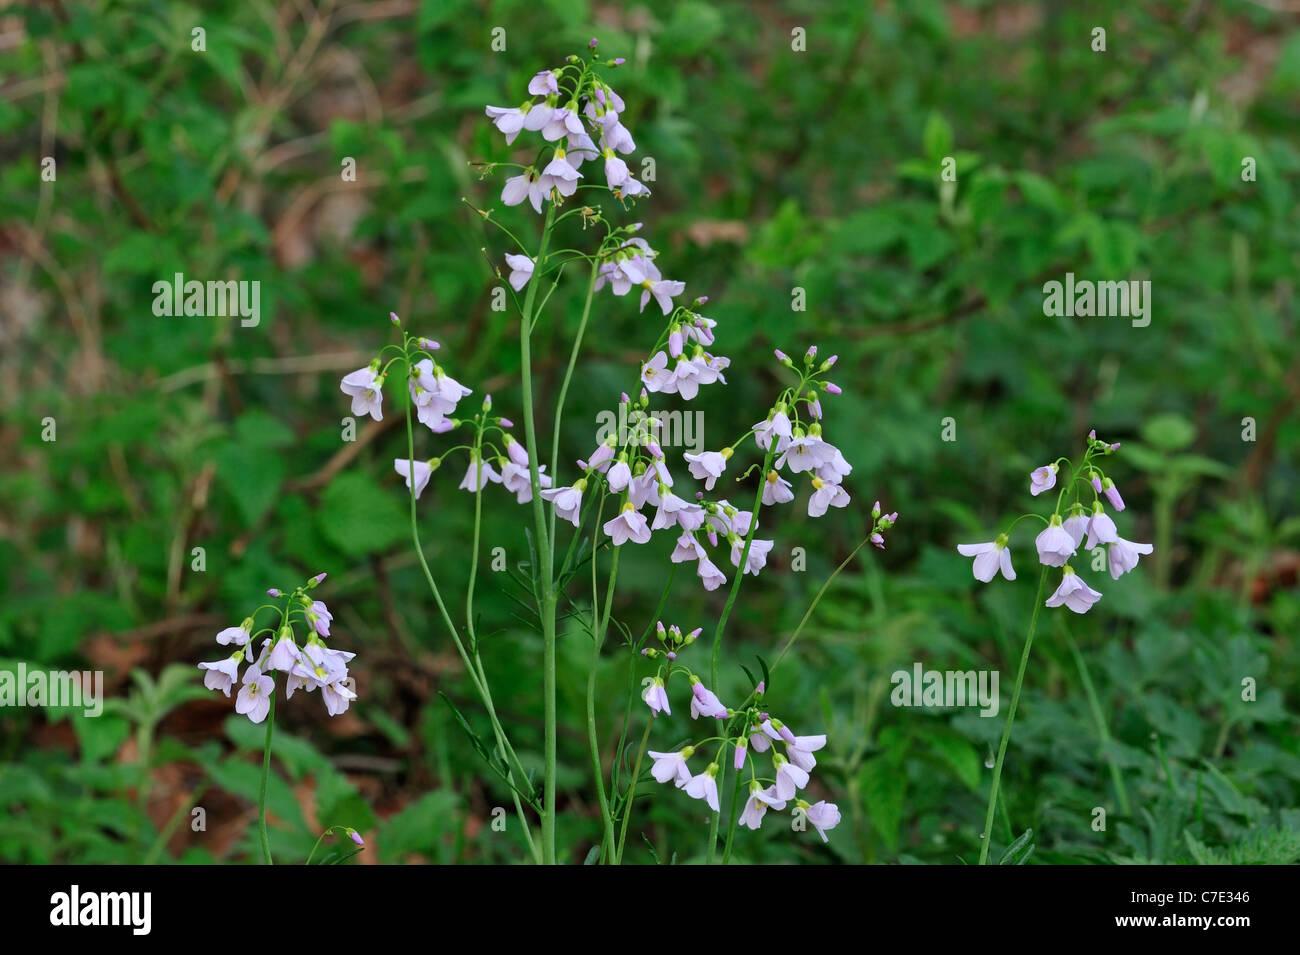 Cuckoo Flower / Lady's Smock (Cardamine pratensis) flowering in meadow Stock Photo